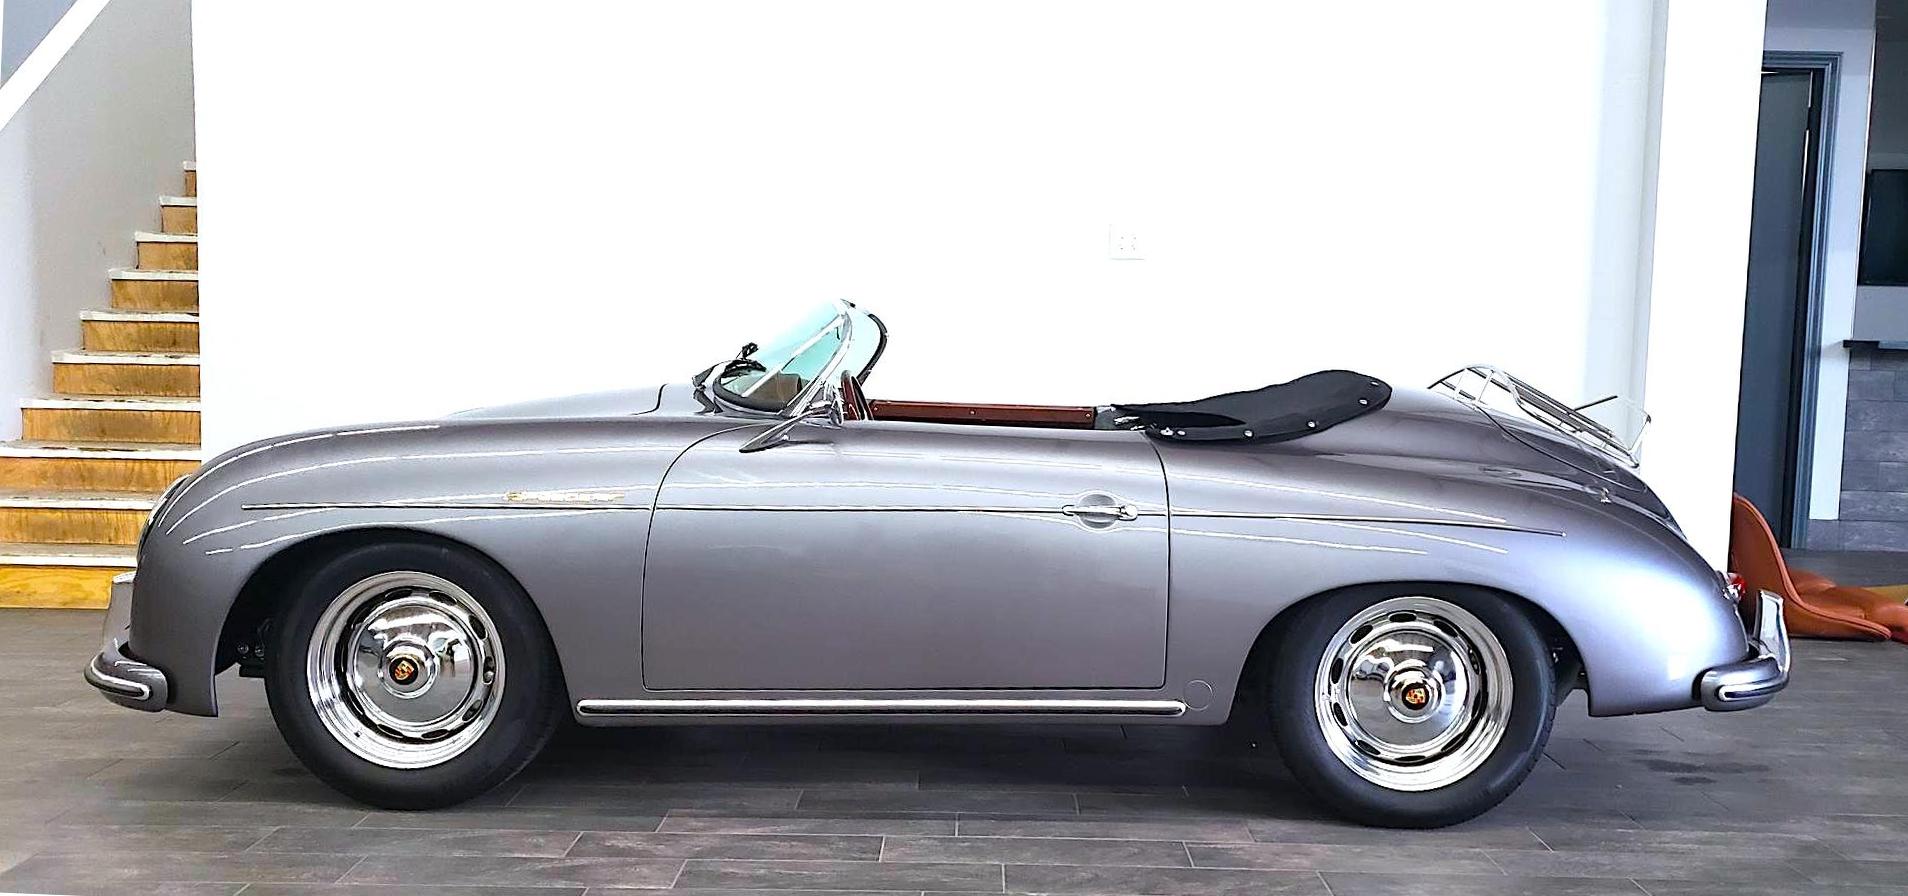 RSO Speedster 356 By Vintage